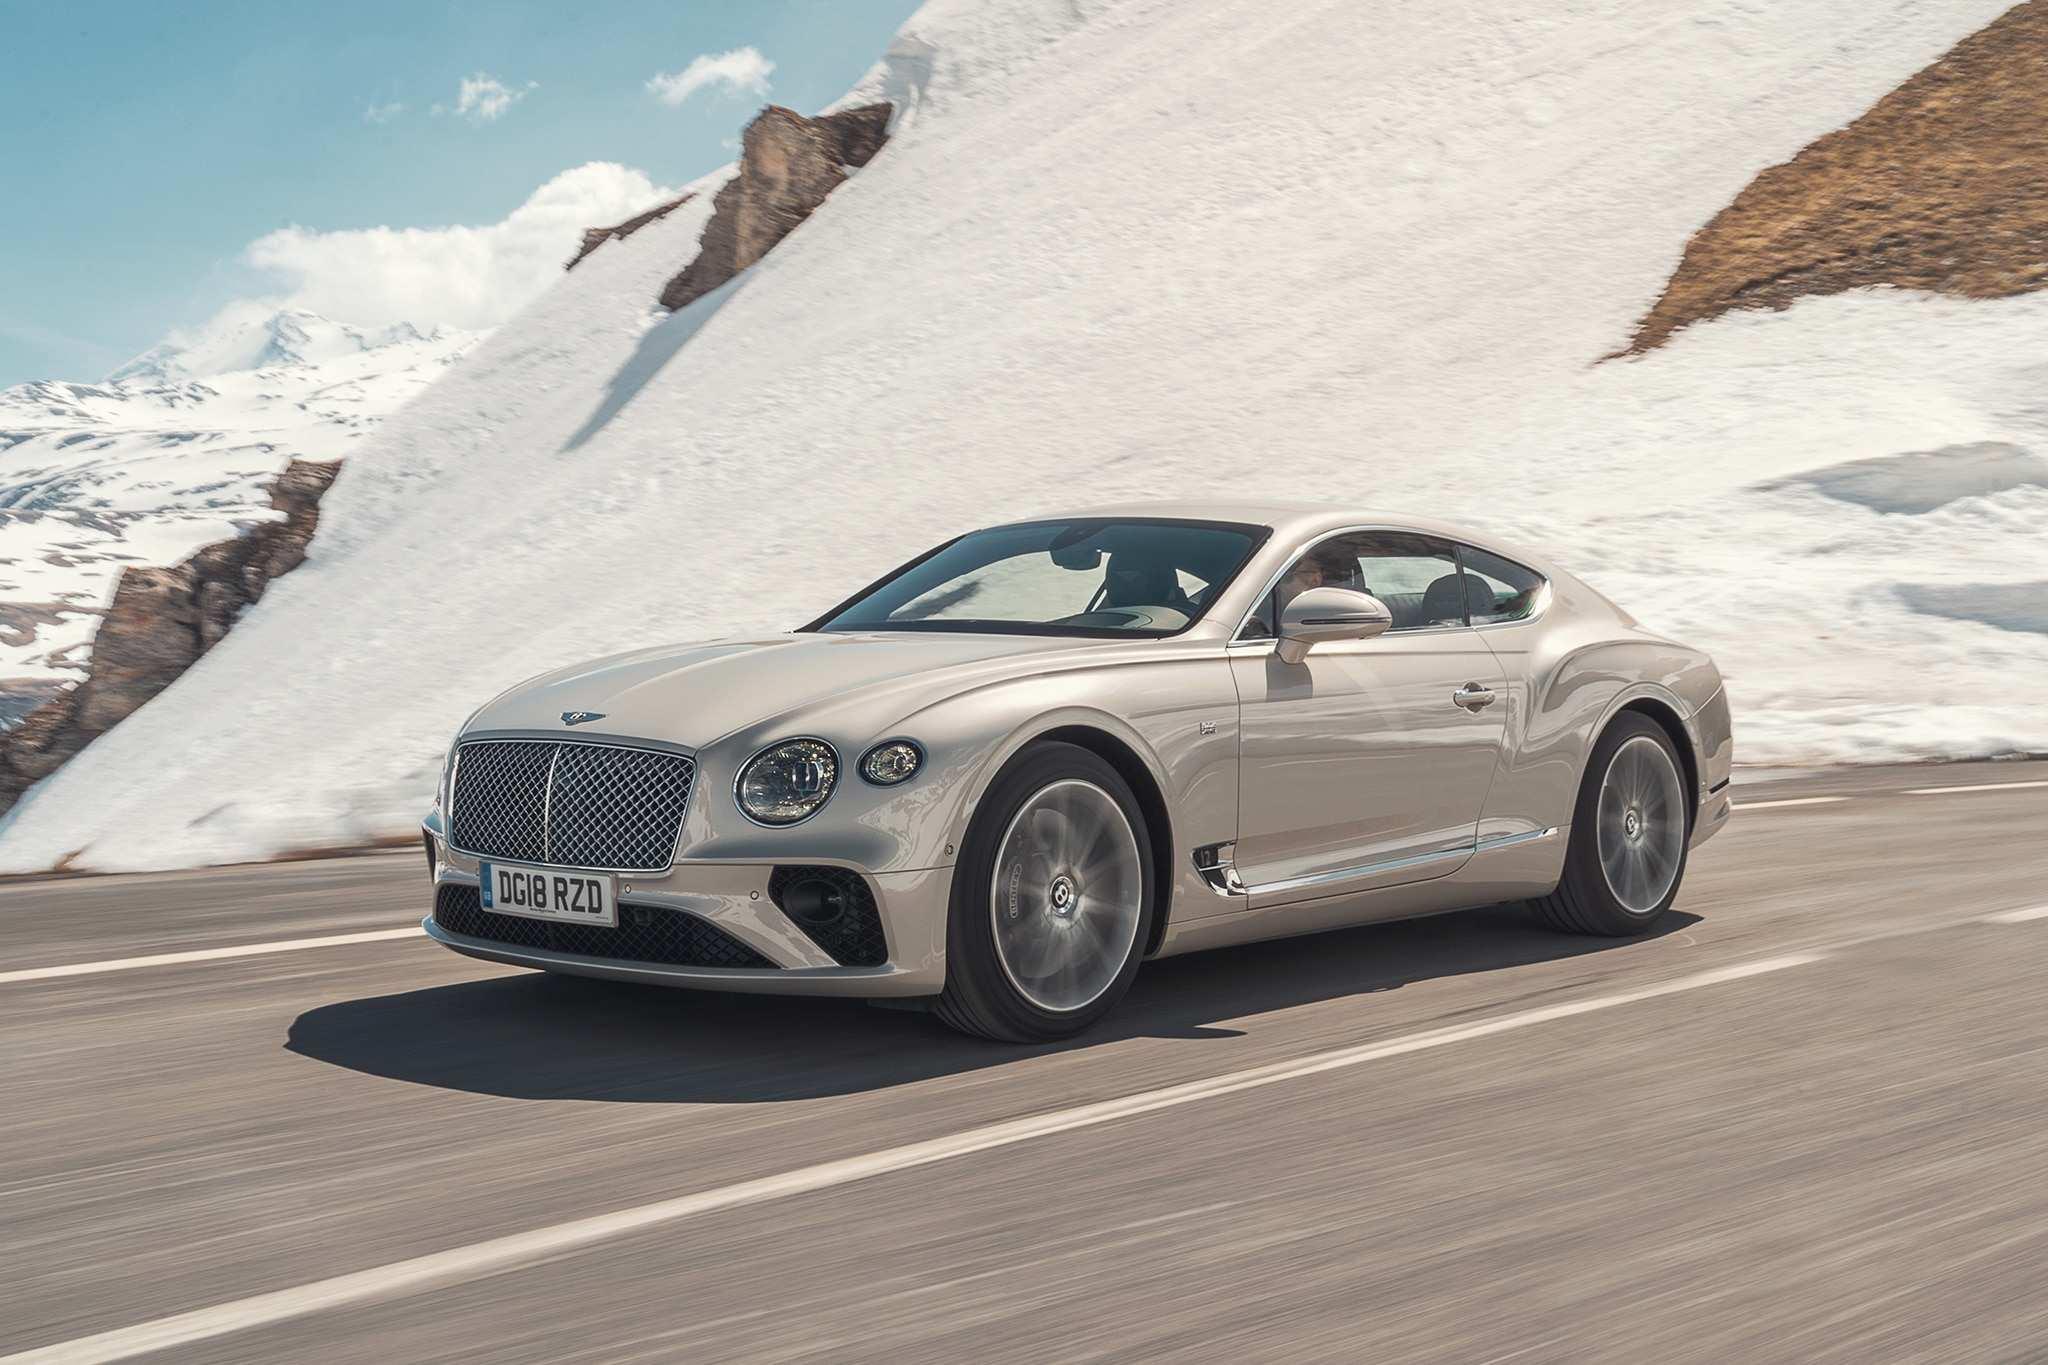 61 New 2019 Bentley Continental Gt Weight Speed Test with 2019 Bentley Continental Gt Weight